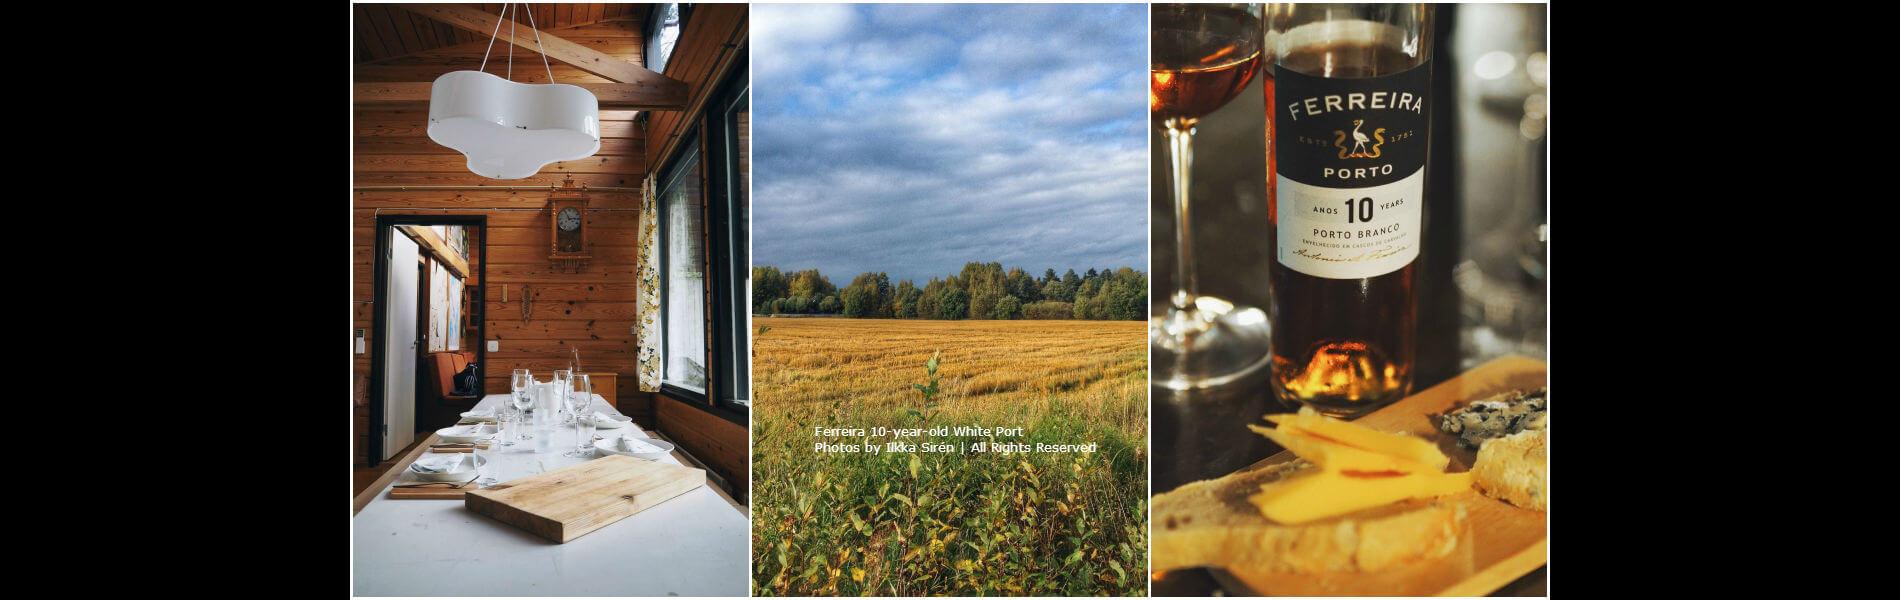 Blend-All-About-Wine-Ferreira-10-Years-White-Port-Slider